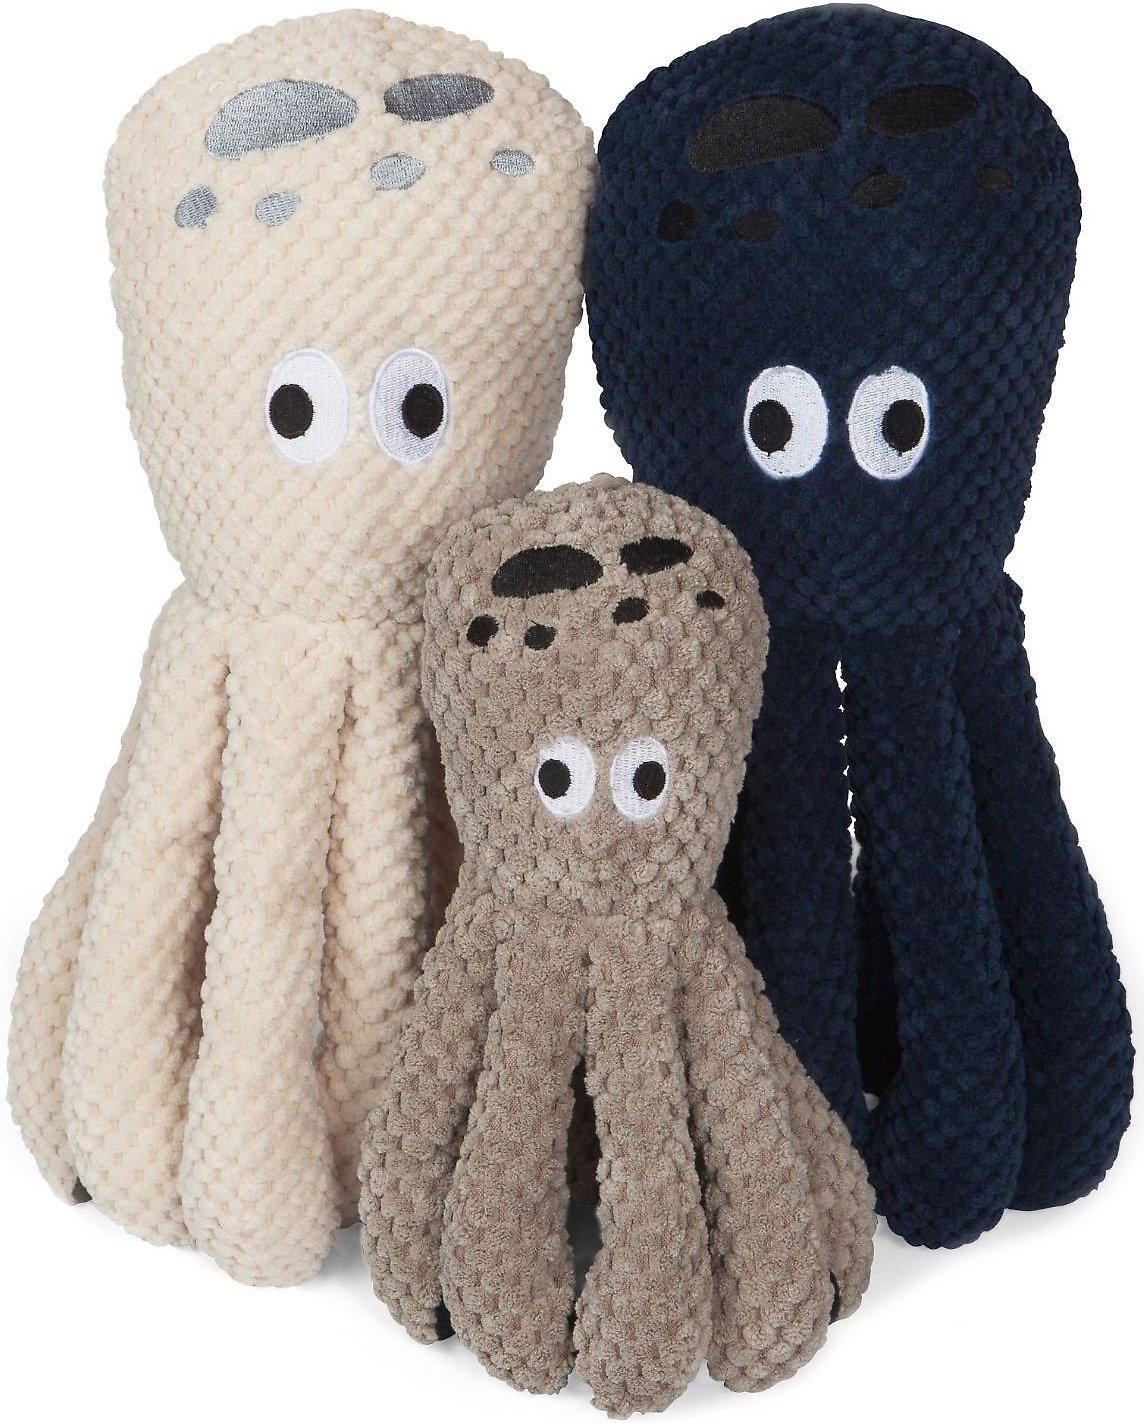 fabdog Floppy Plush Dog Toy, Octopus, Small